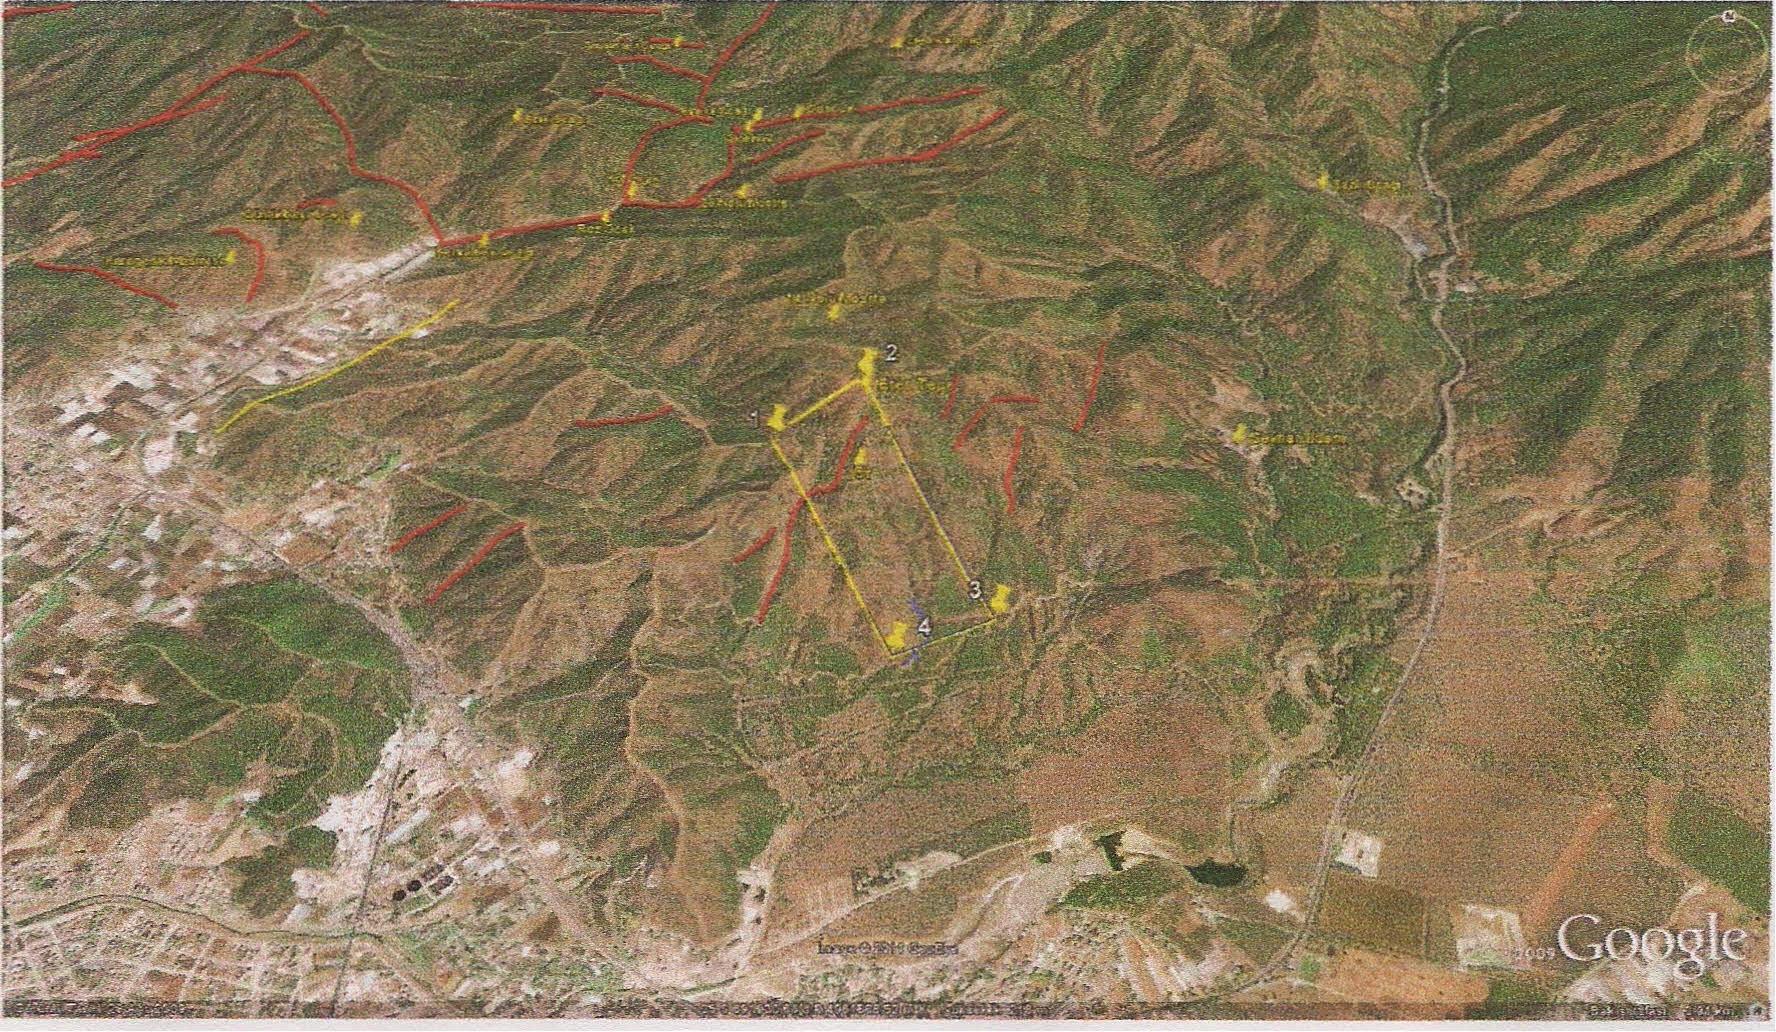 Turkey Chrome Mine For Sale 2